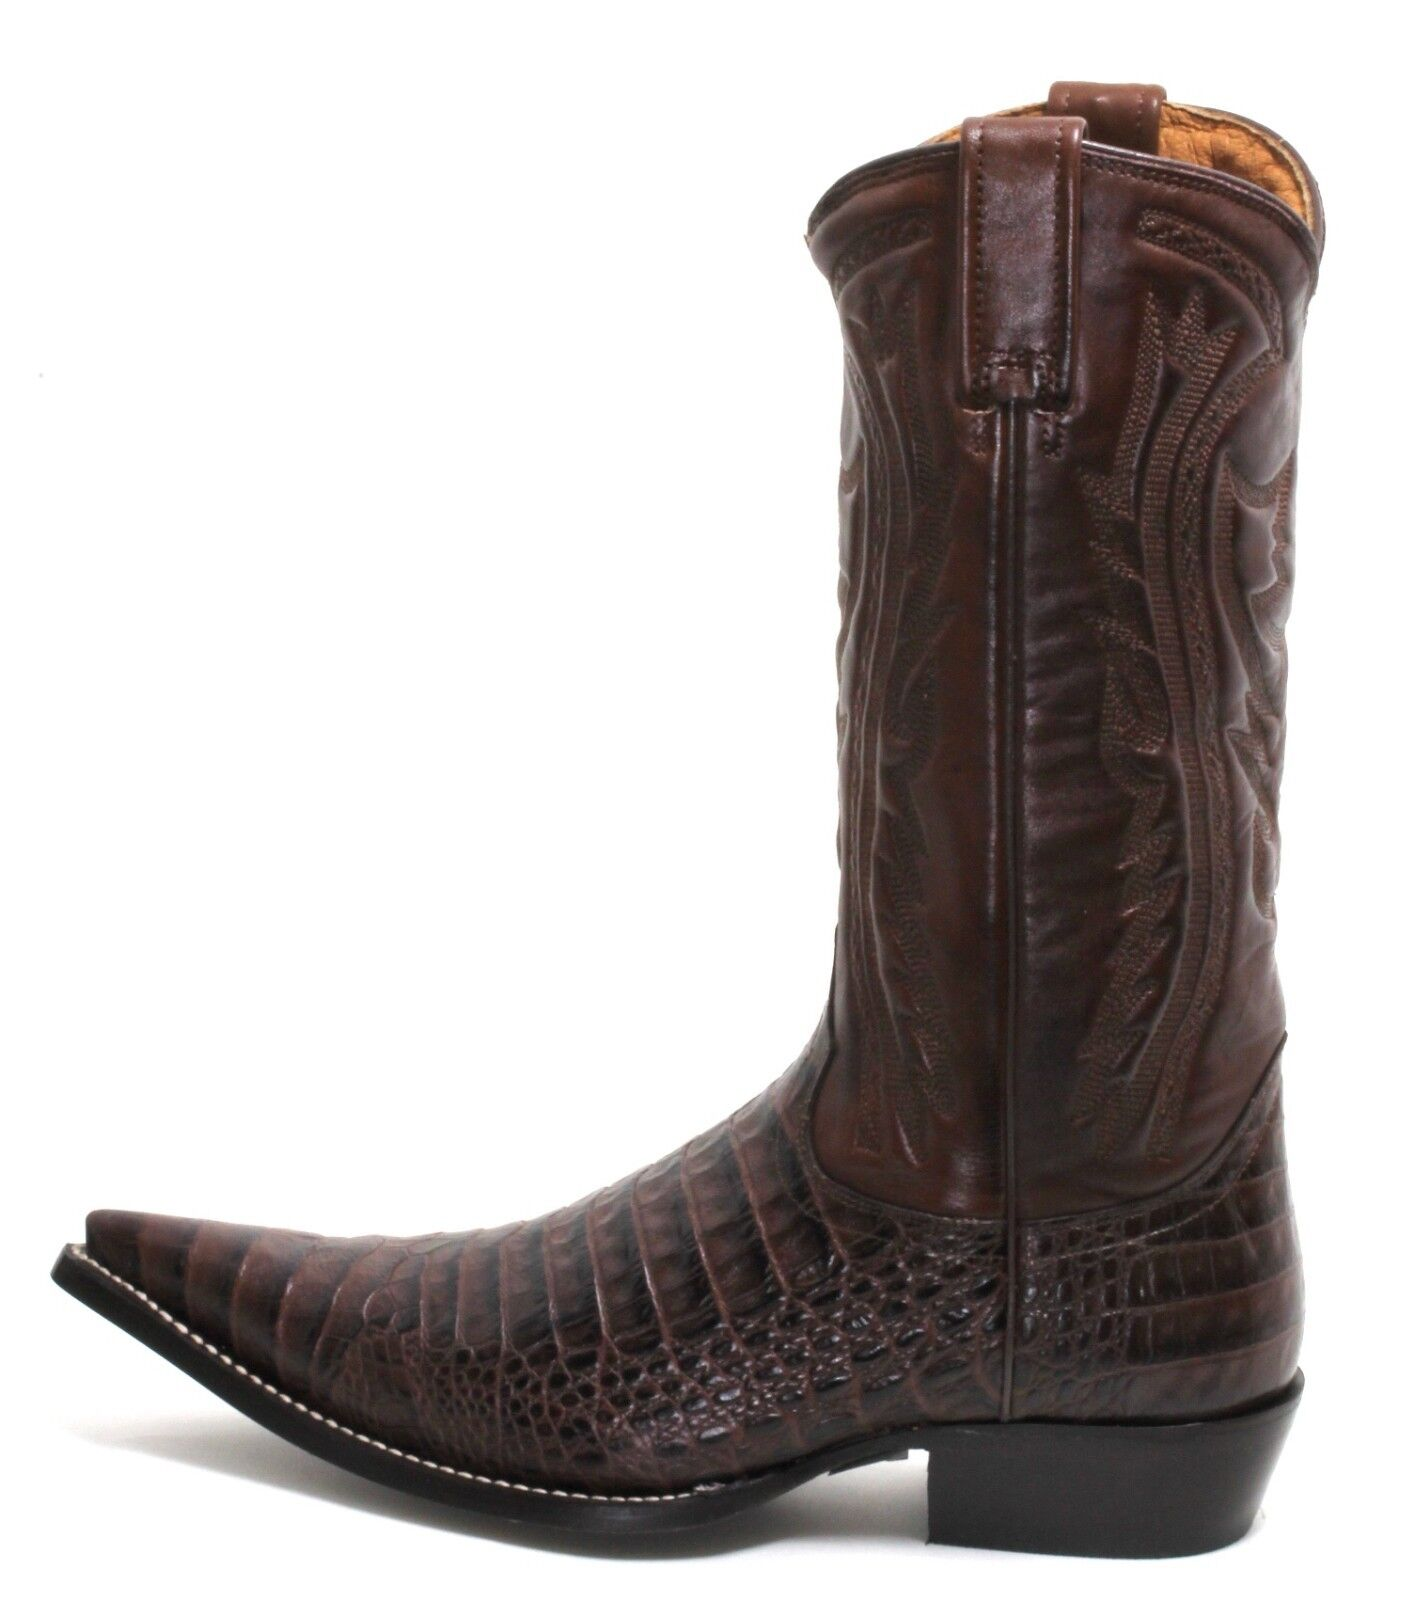 185 Cowboy Stivali Stivali Western Western Western Texas stivali Catalan Style Pottawatomie Marrone 46 c39646